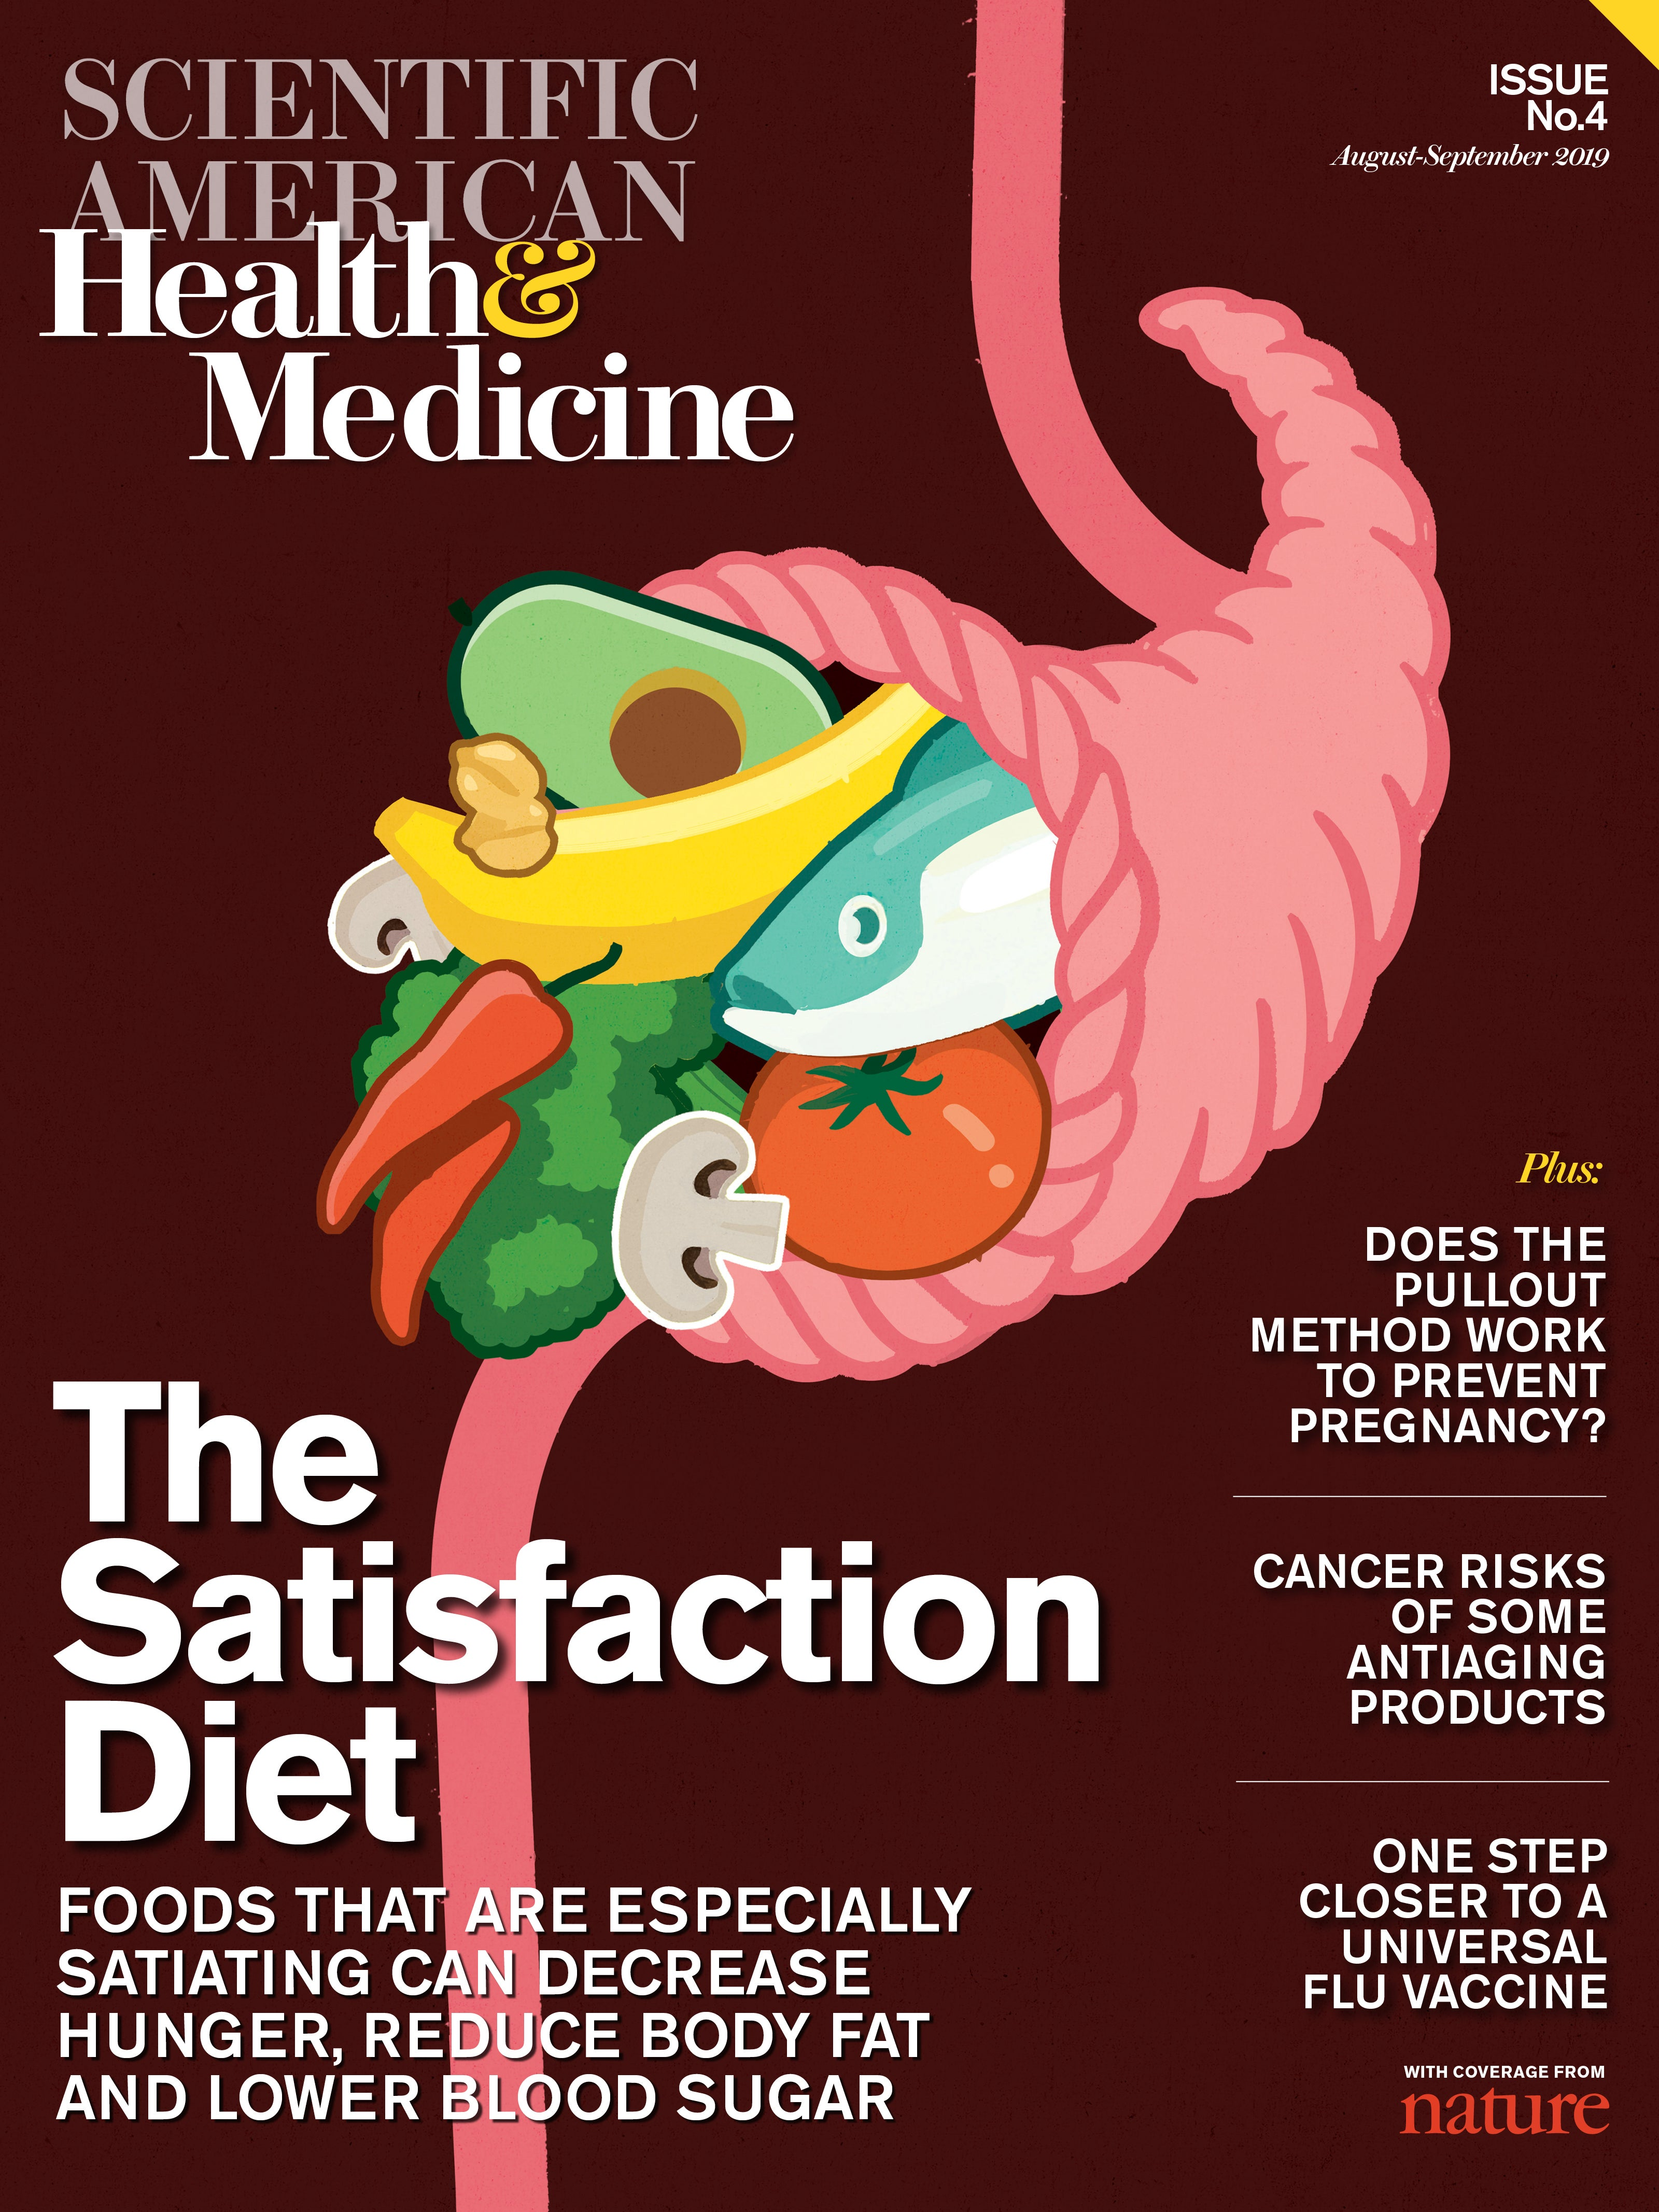 Scientific American Health & Medicine, Volume 1, Issue 4